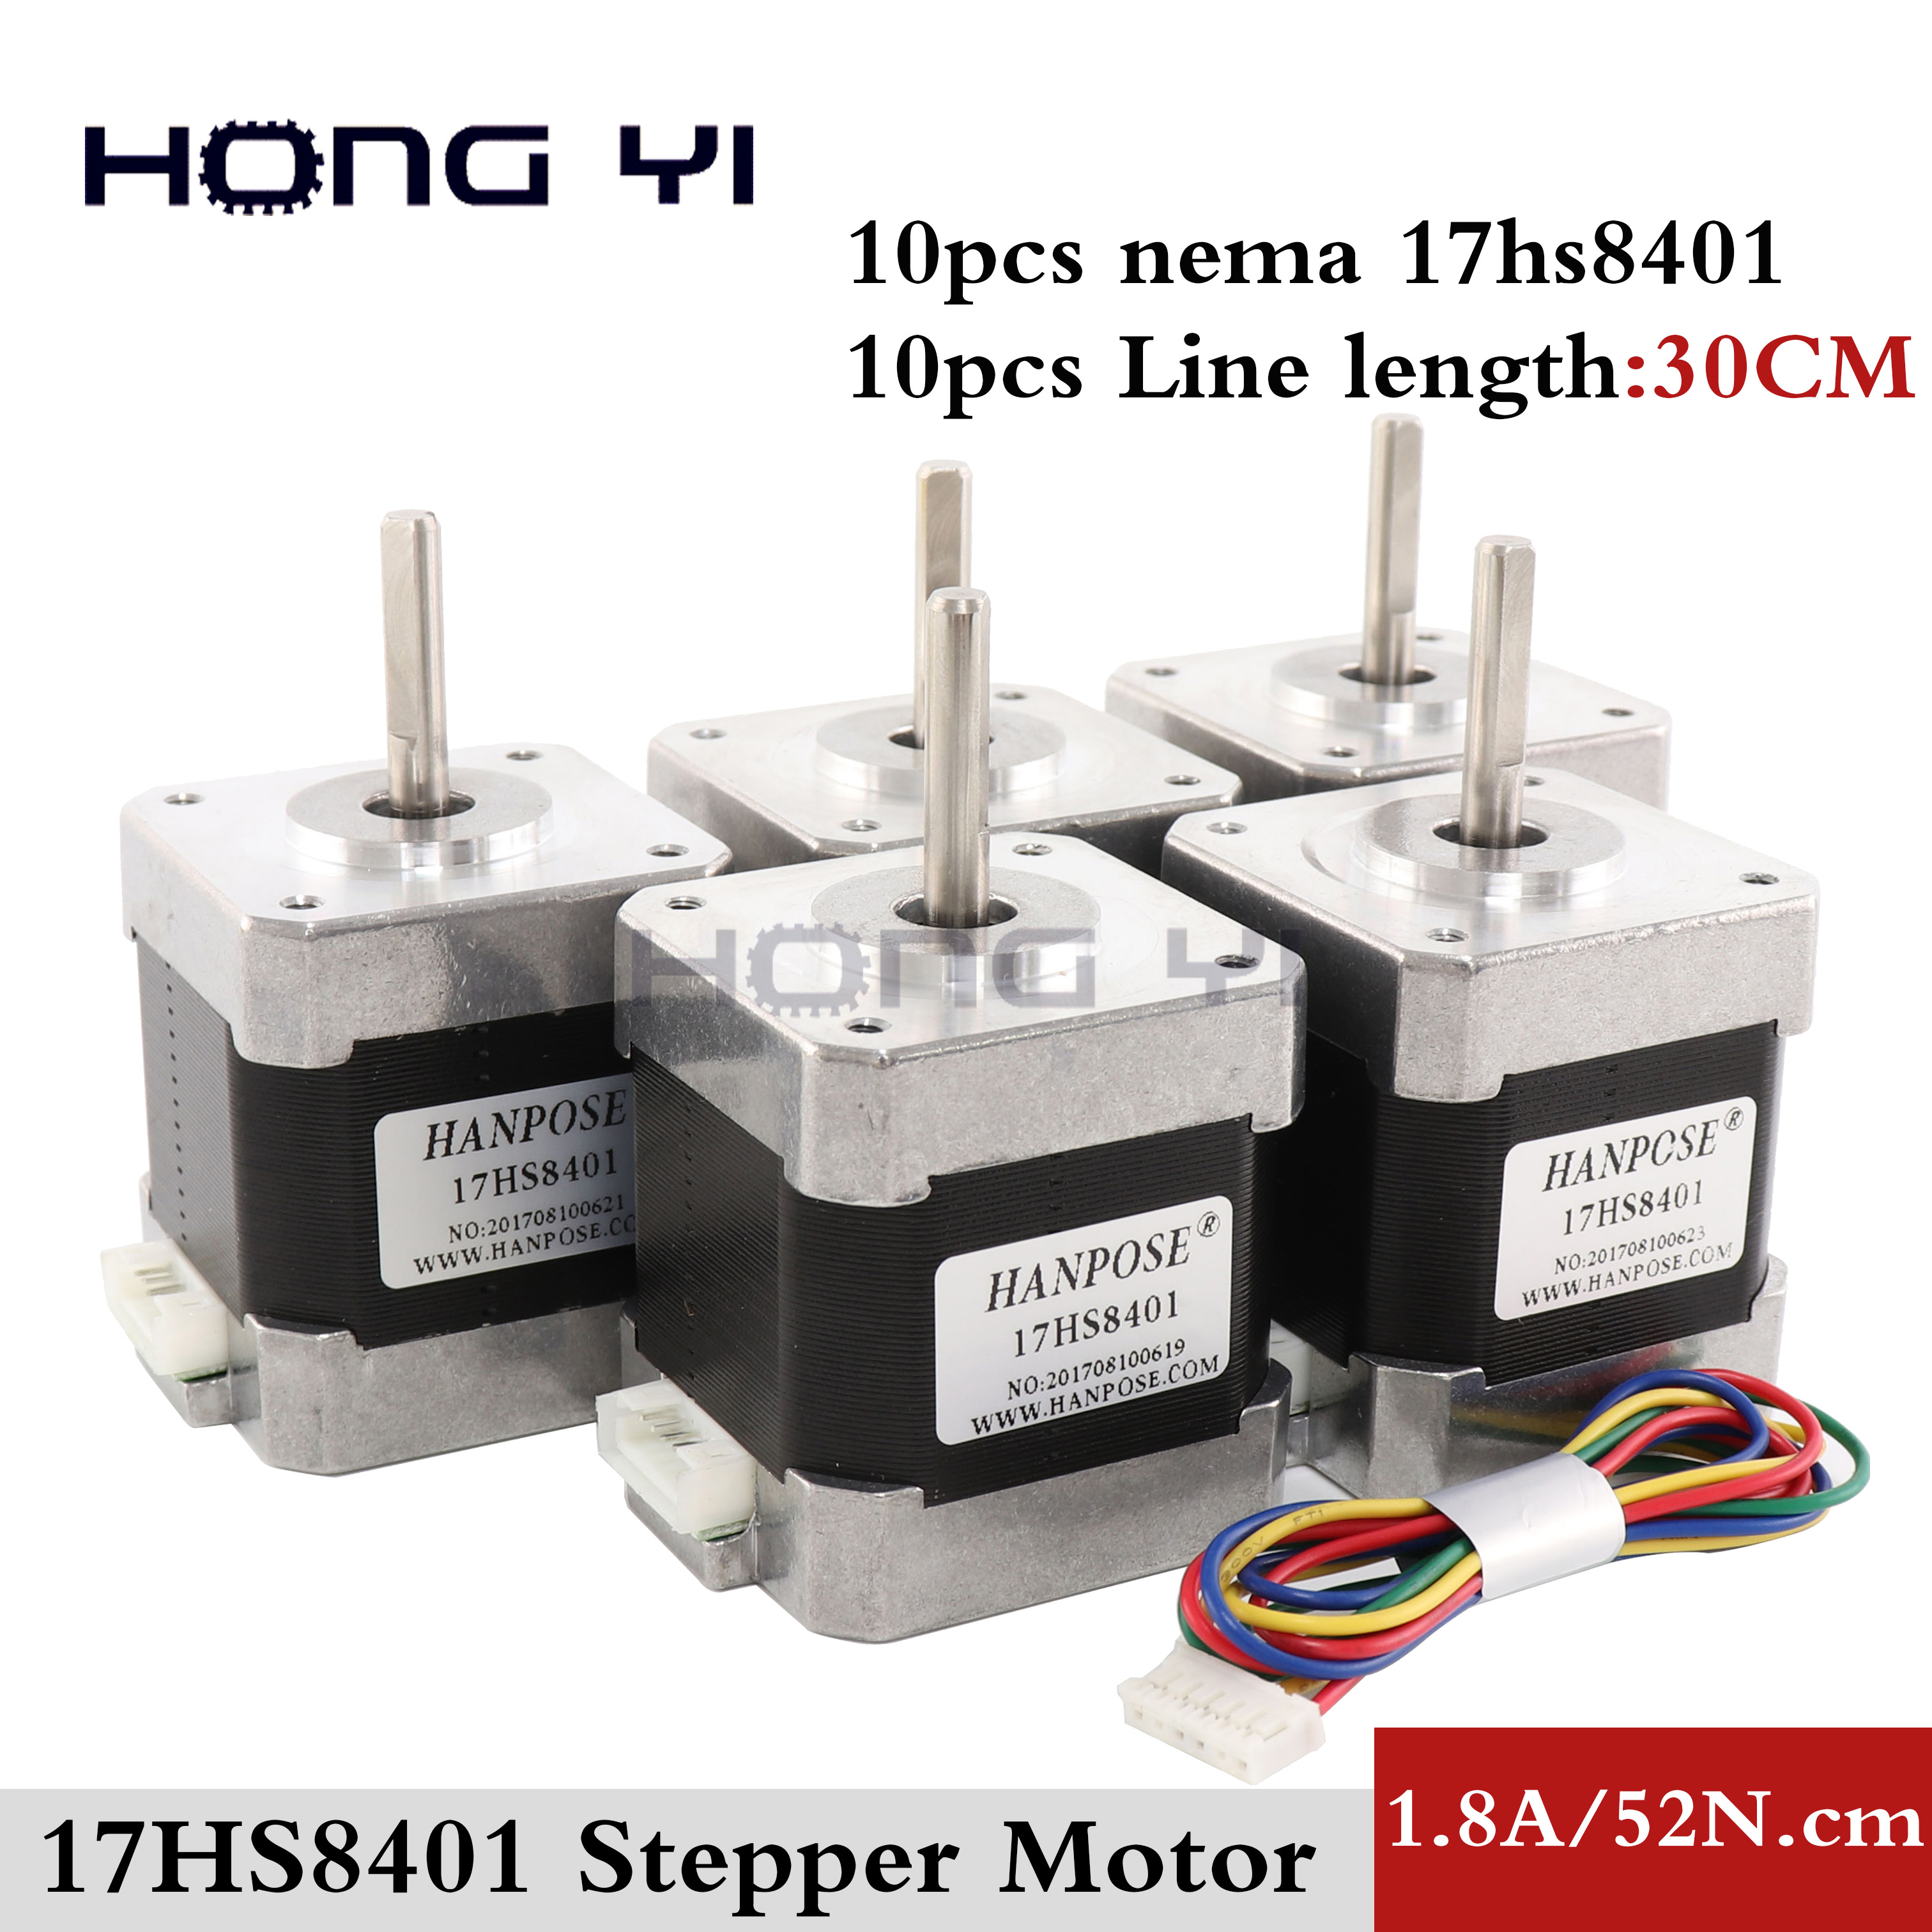 10 PCS / lot 4 lead Nema17 Stepper Motor 42 motor 17HS8401  1.8A CE ROSH ISO CNC Laser Grind Foam Plasma Cut 3D printer-in Stepper Motor from Home Improvement    1